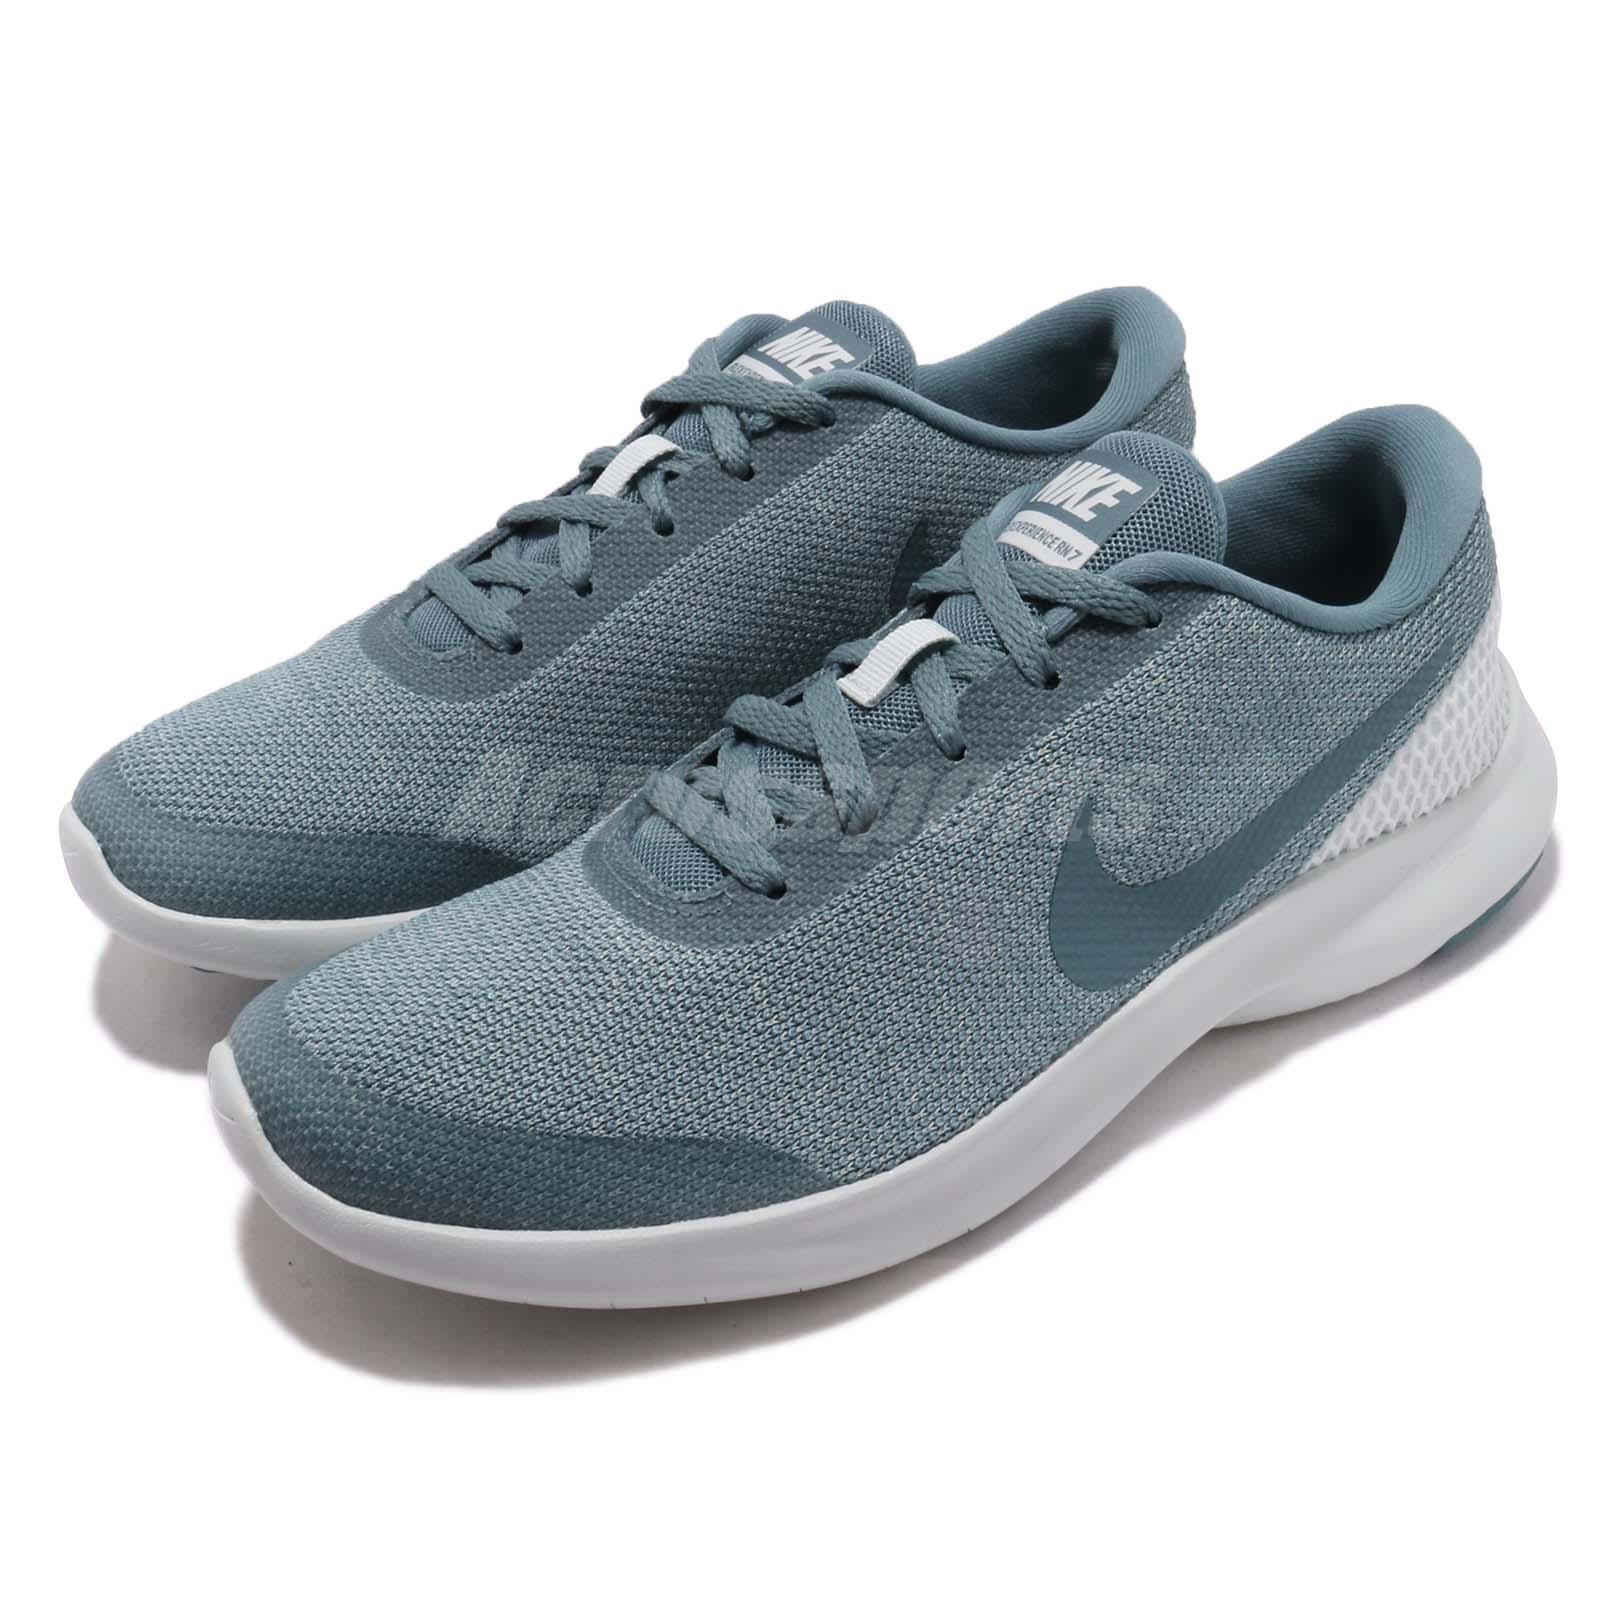 Nike Wmns Flex Experience RN 7 VII Celestial Teal femmes Running chaussures 908996-404